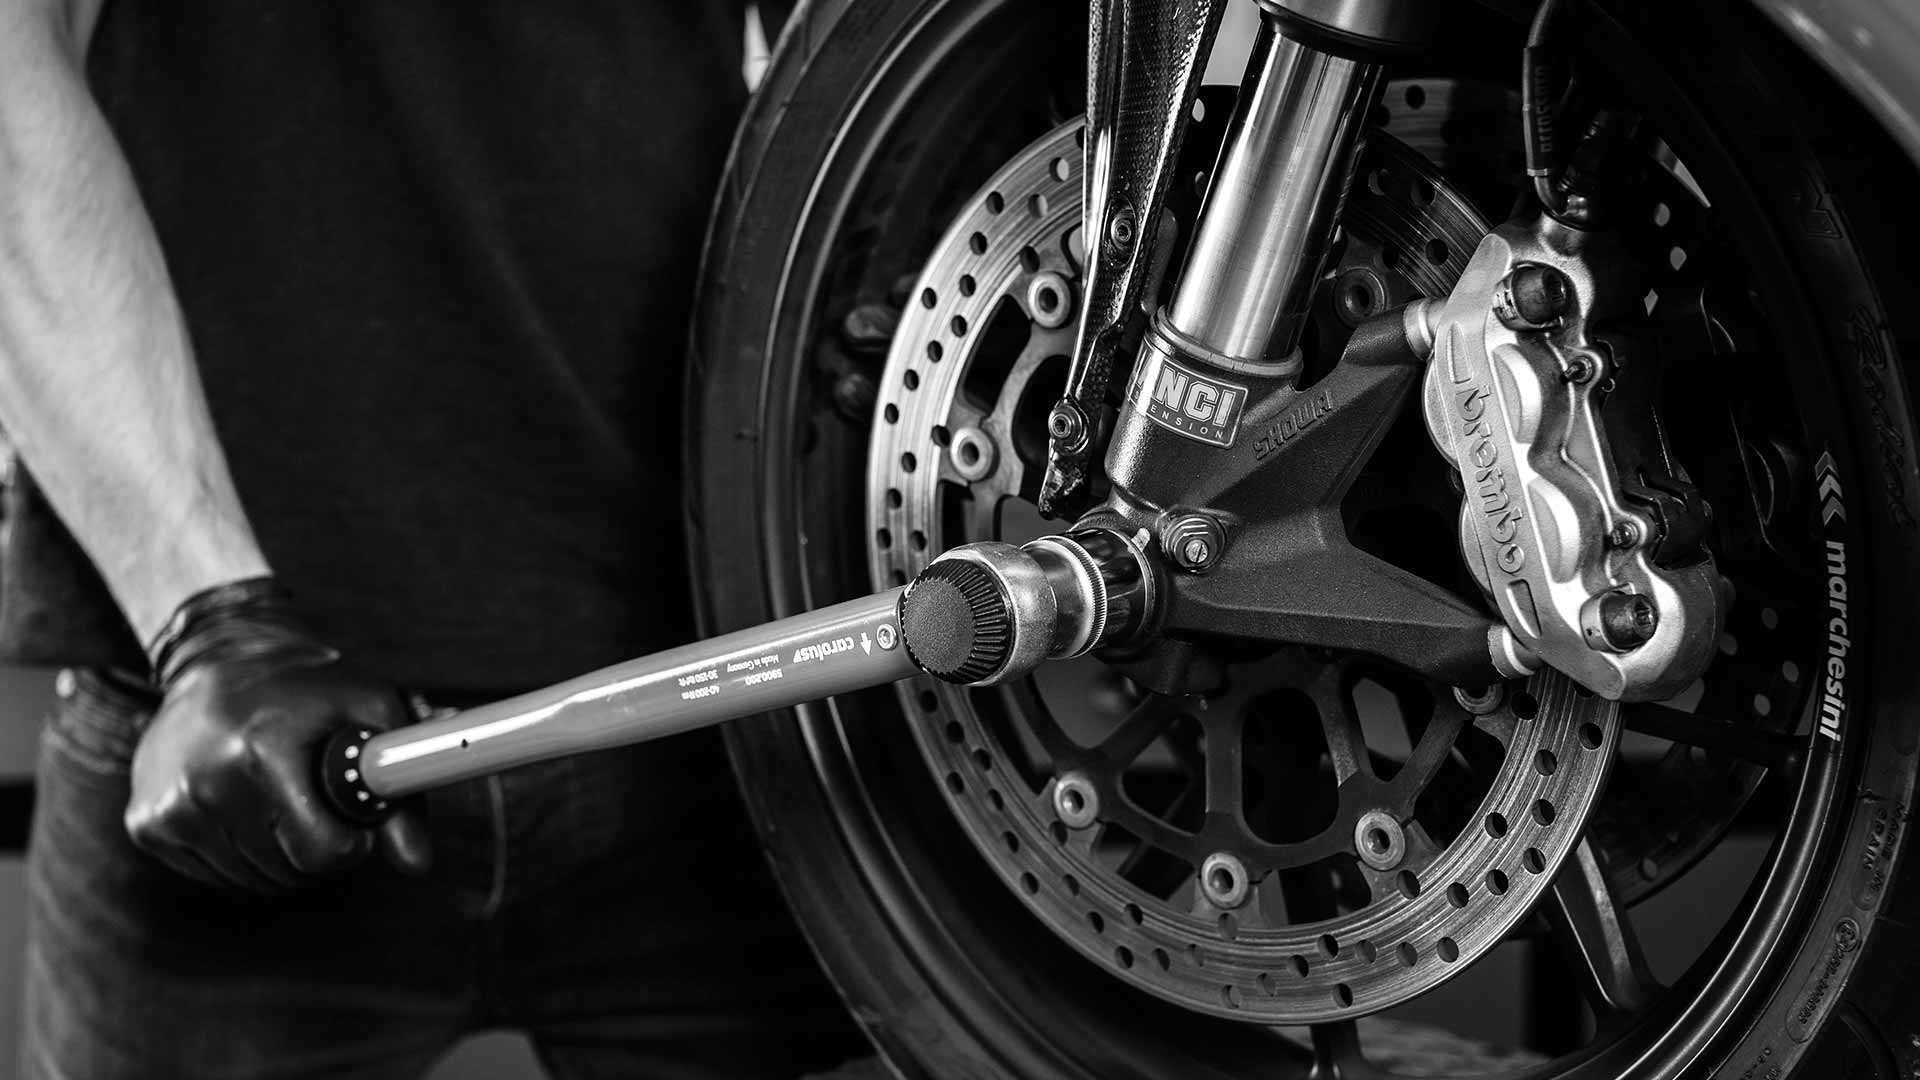 Motorrad Bremsen erneuern lassen Solingen